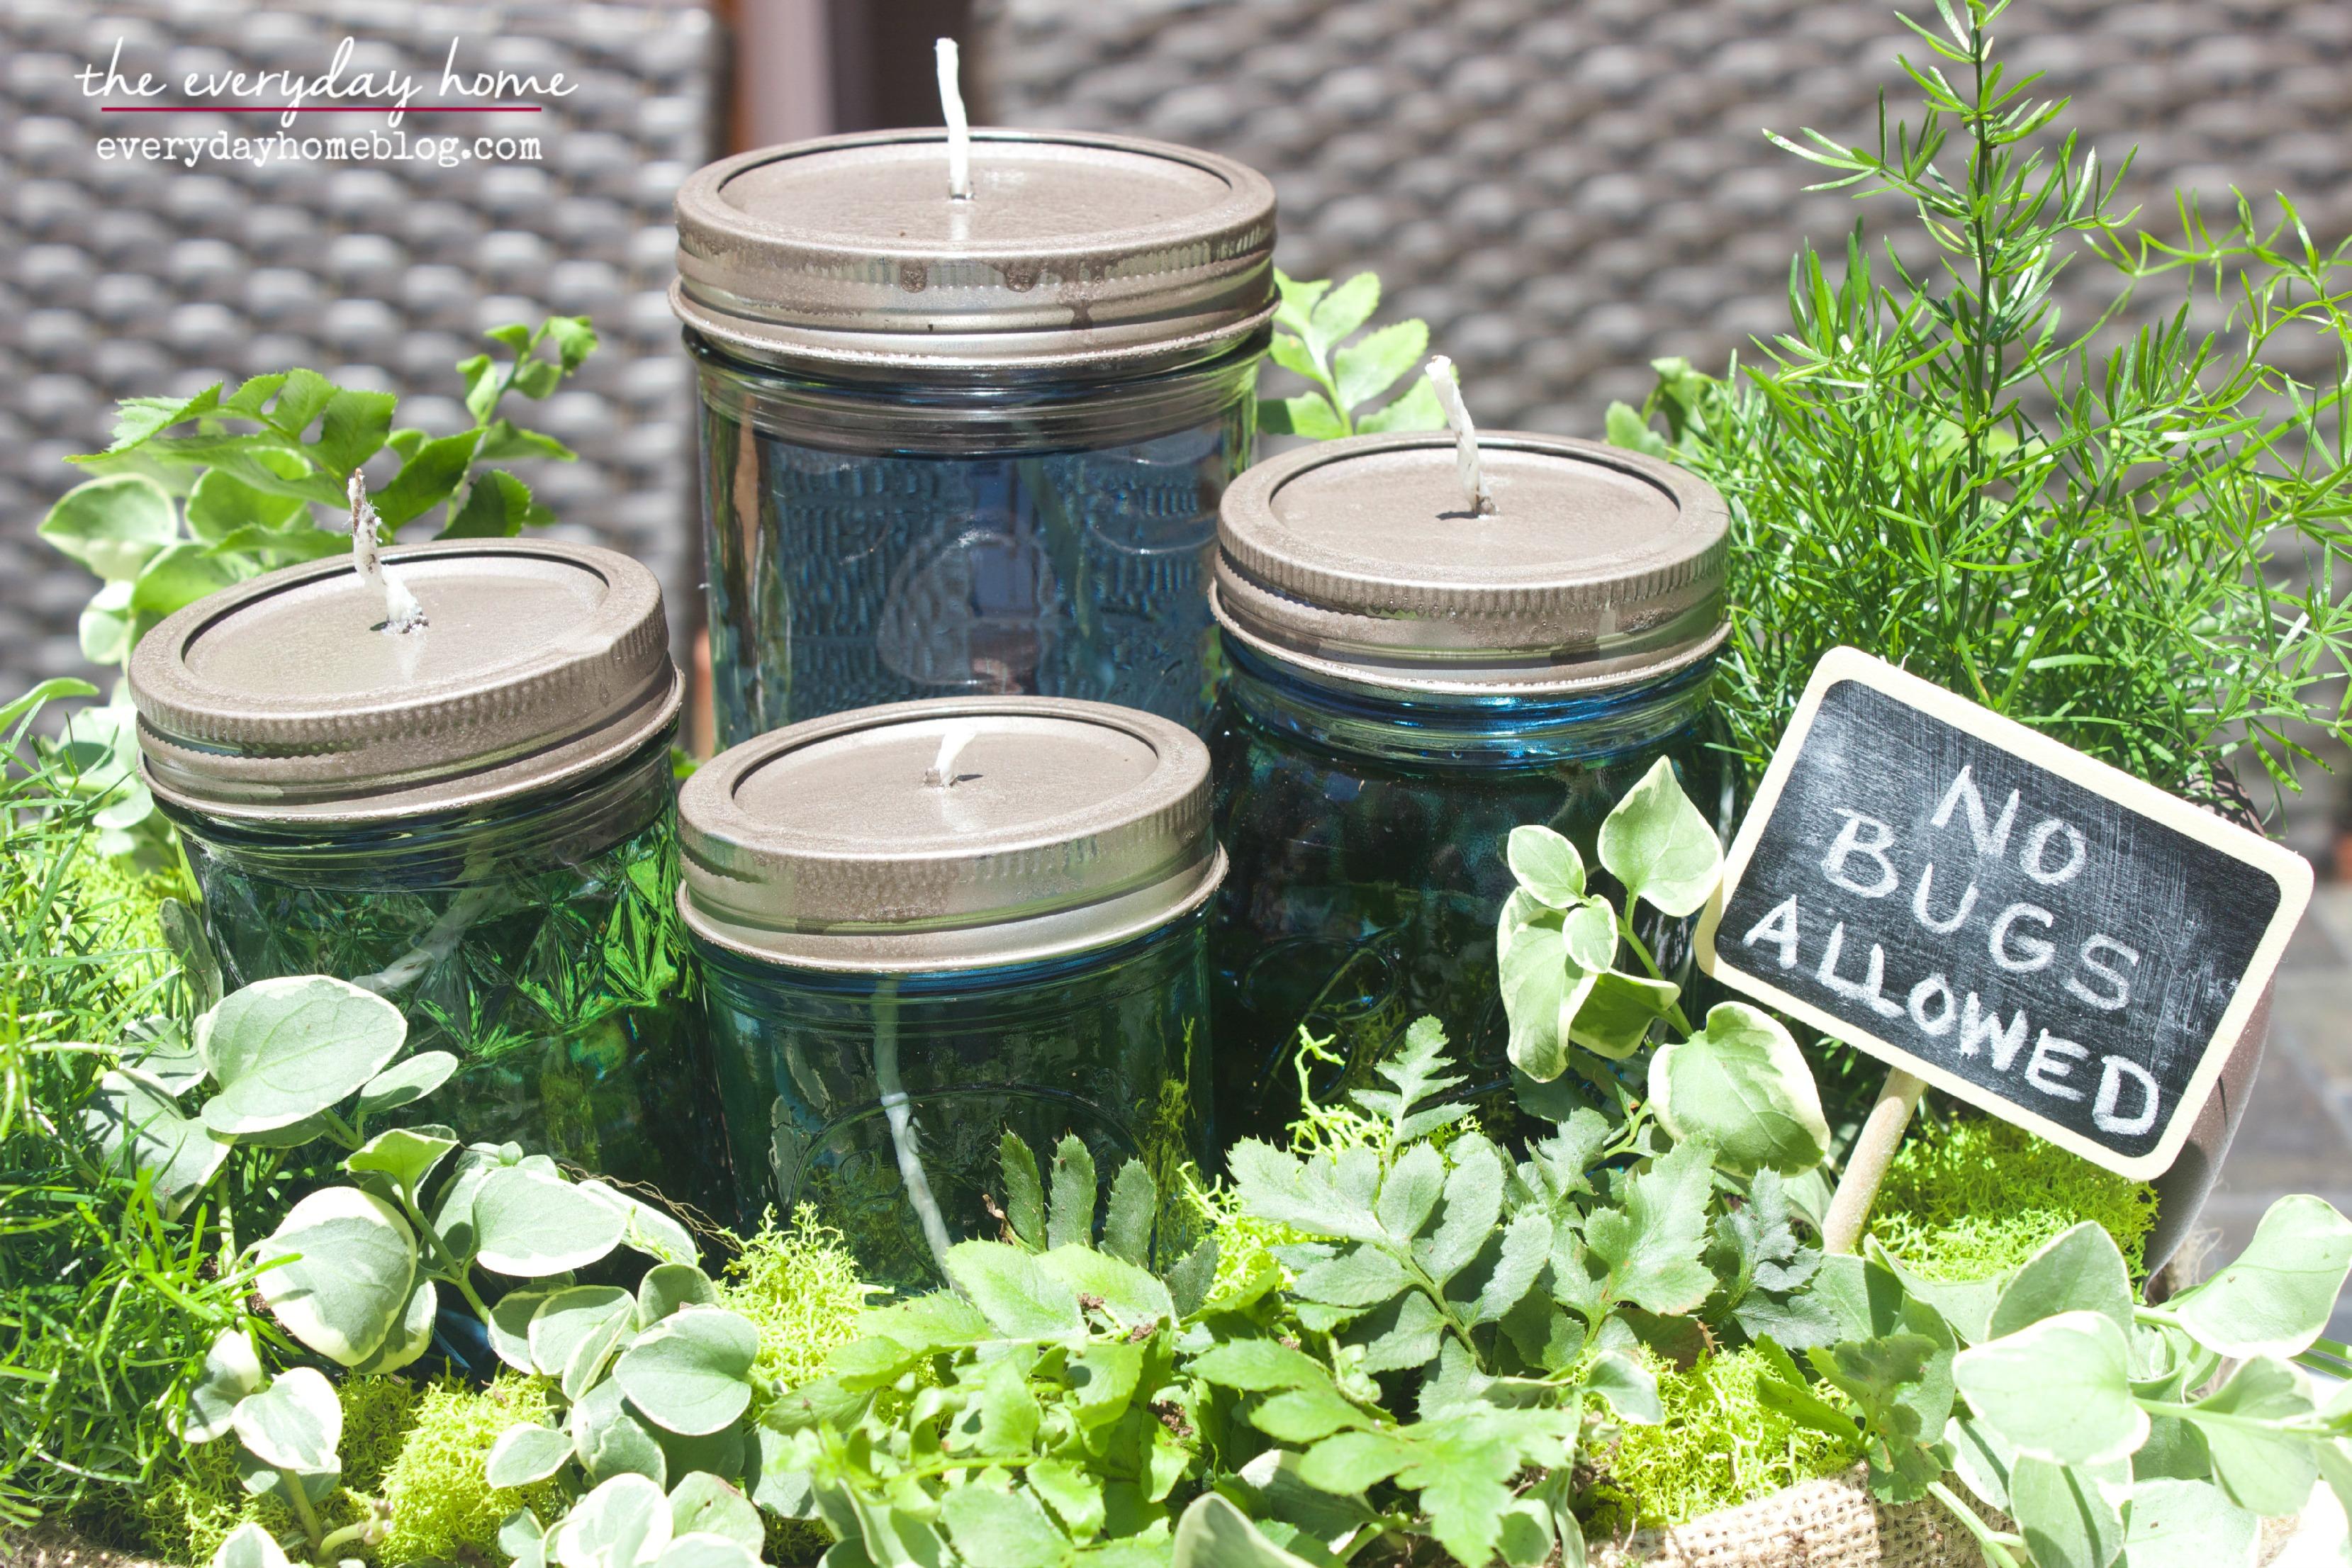 DIY Citronella Mason Jar Candles The Everyday Home Blog www.everydayhomeblog.com (21)